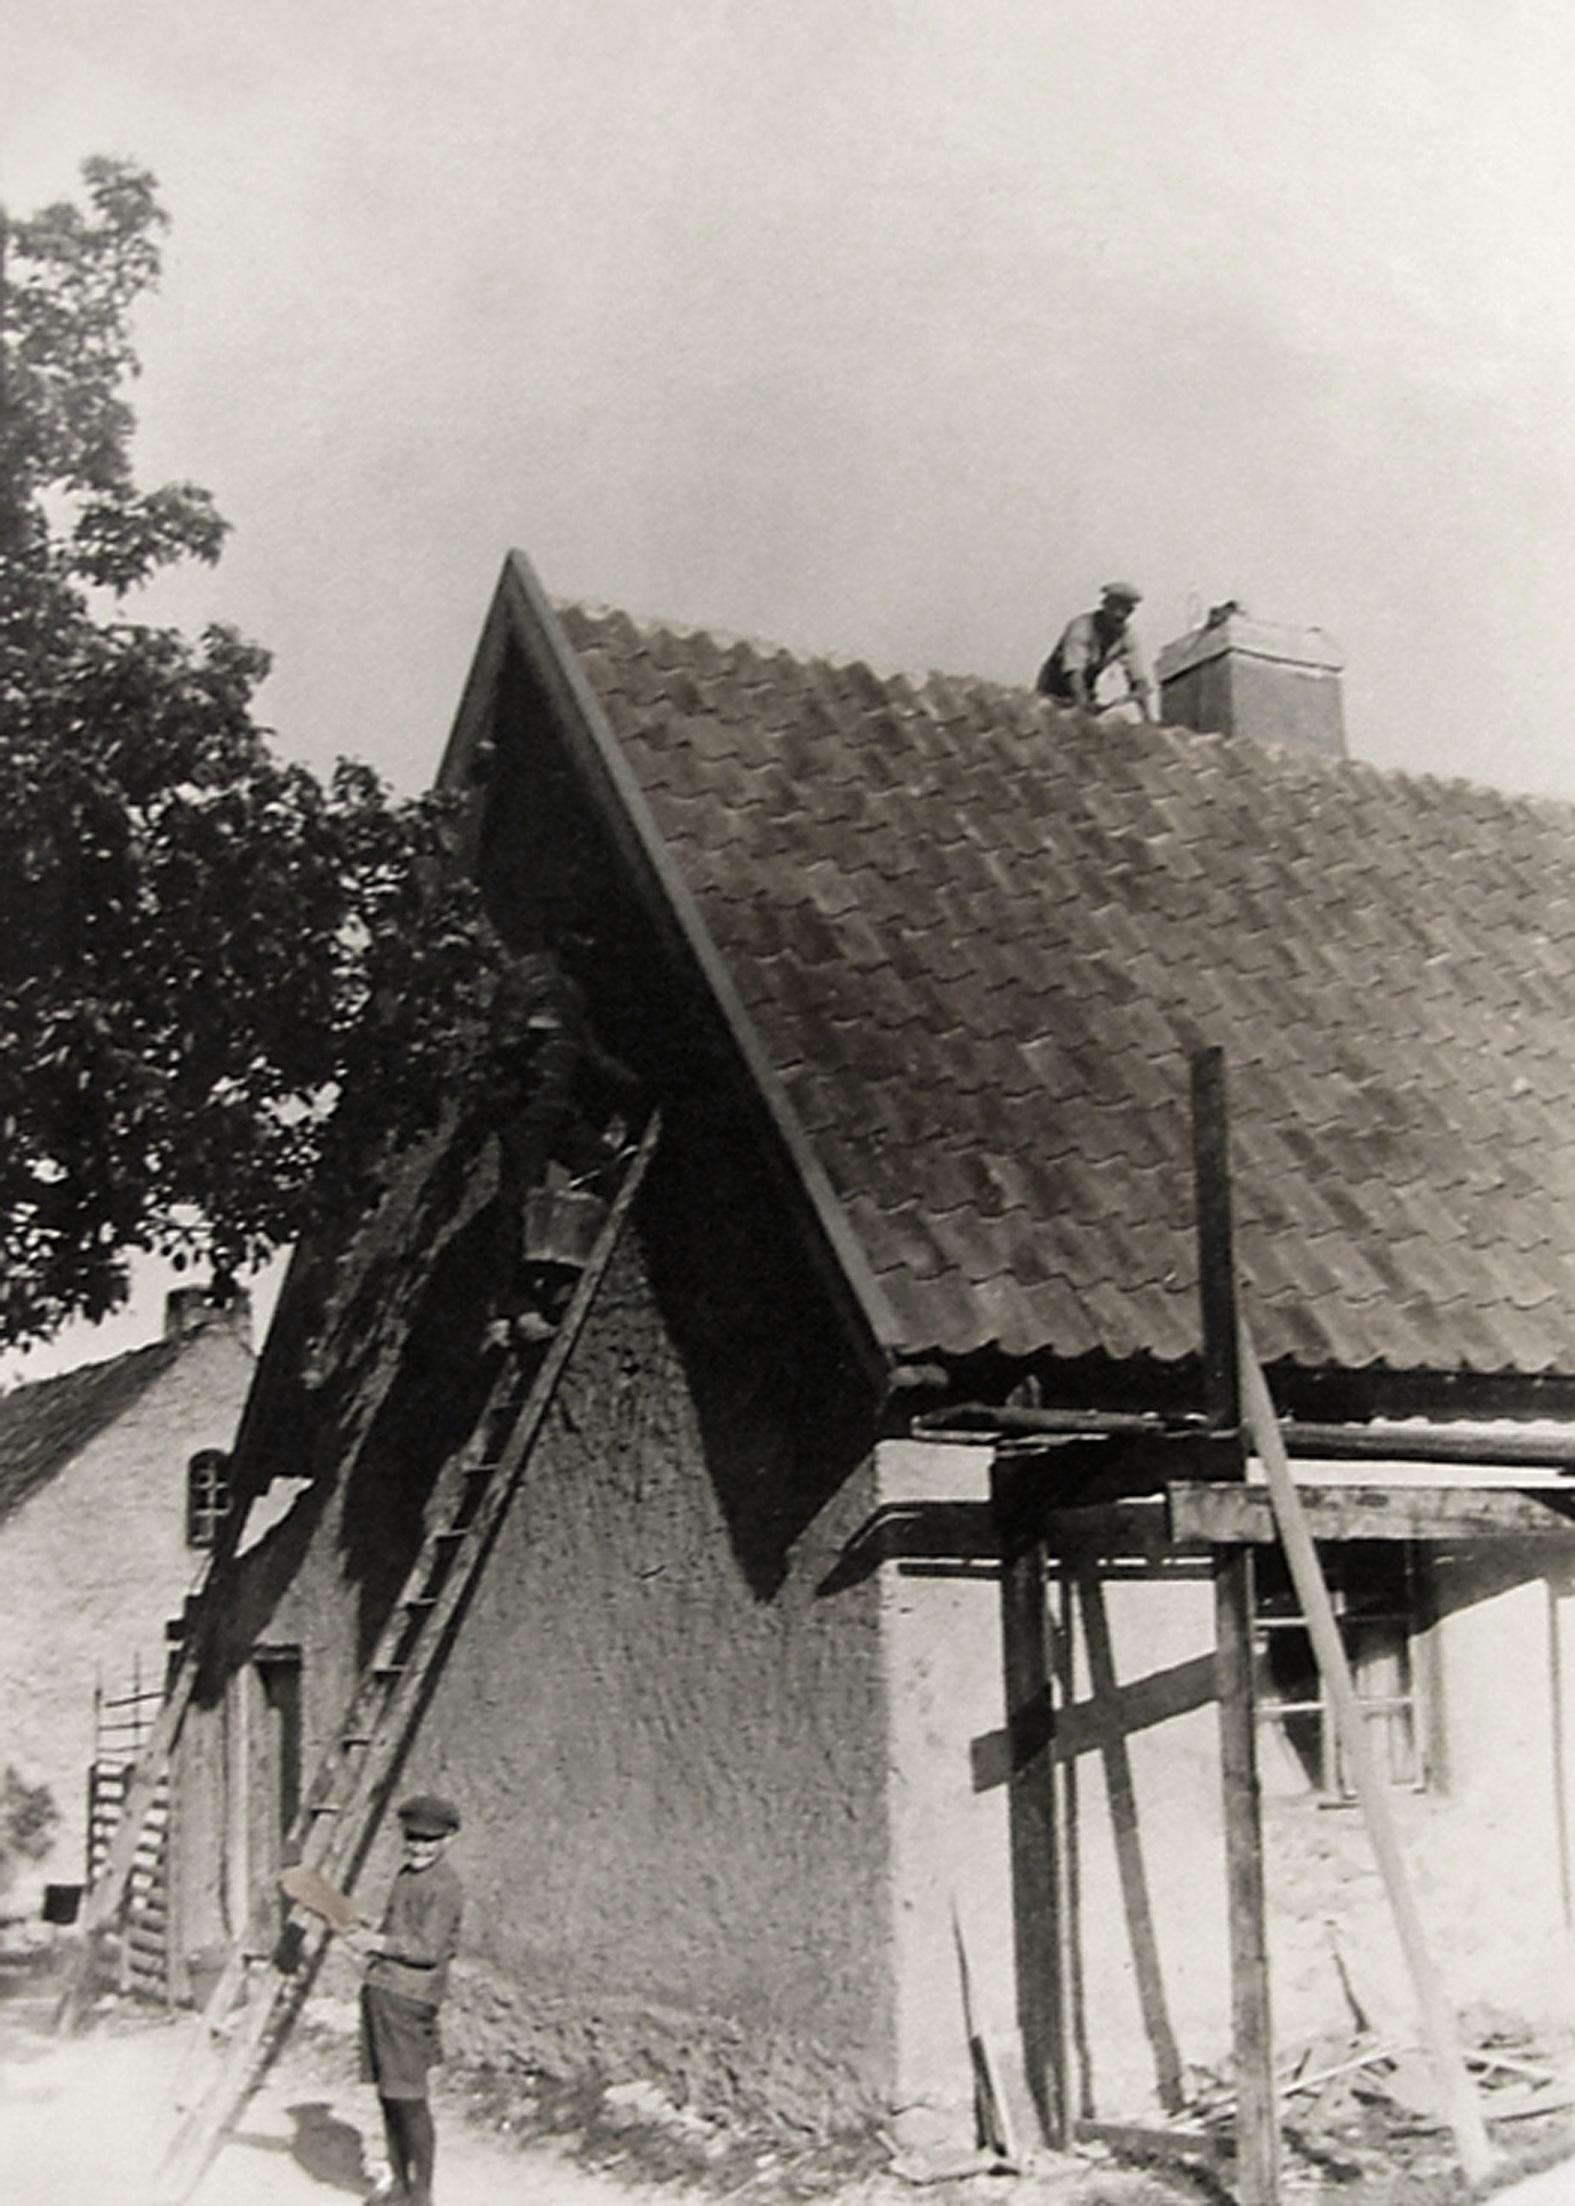 Renovering av taket på brygghuset kring sekelskiftet 1900.   Renovation of the roof of the bridge building around the turn of the century 1900.